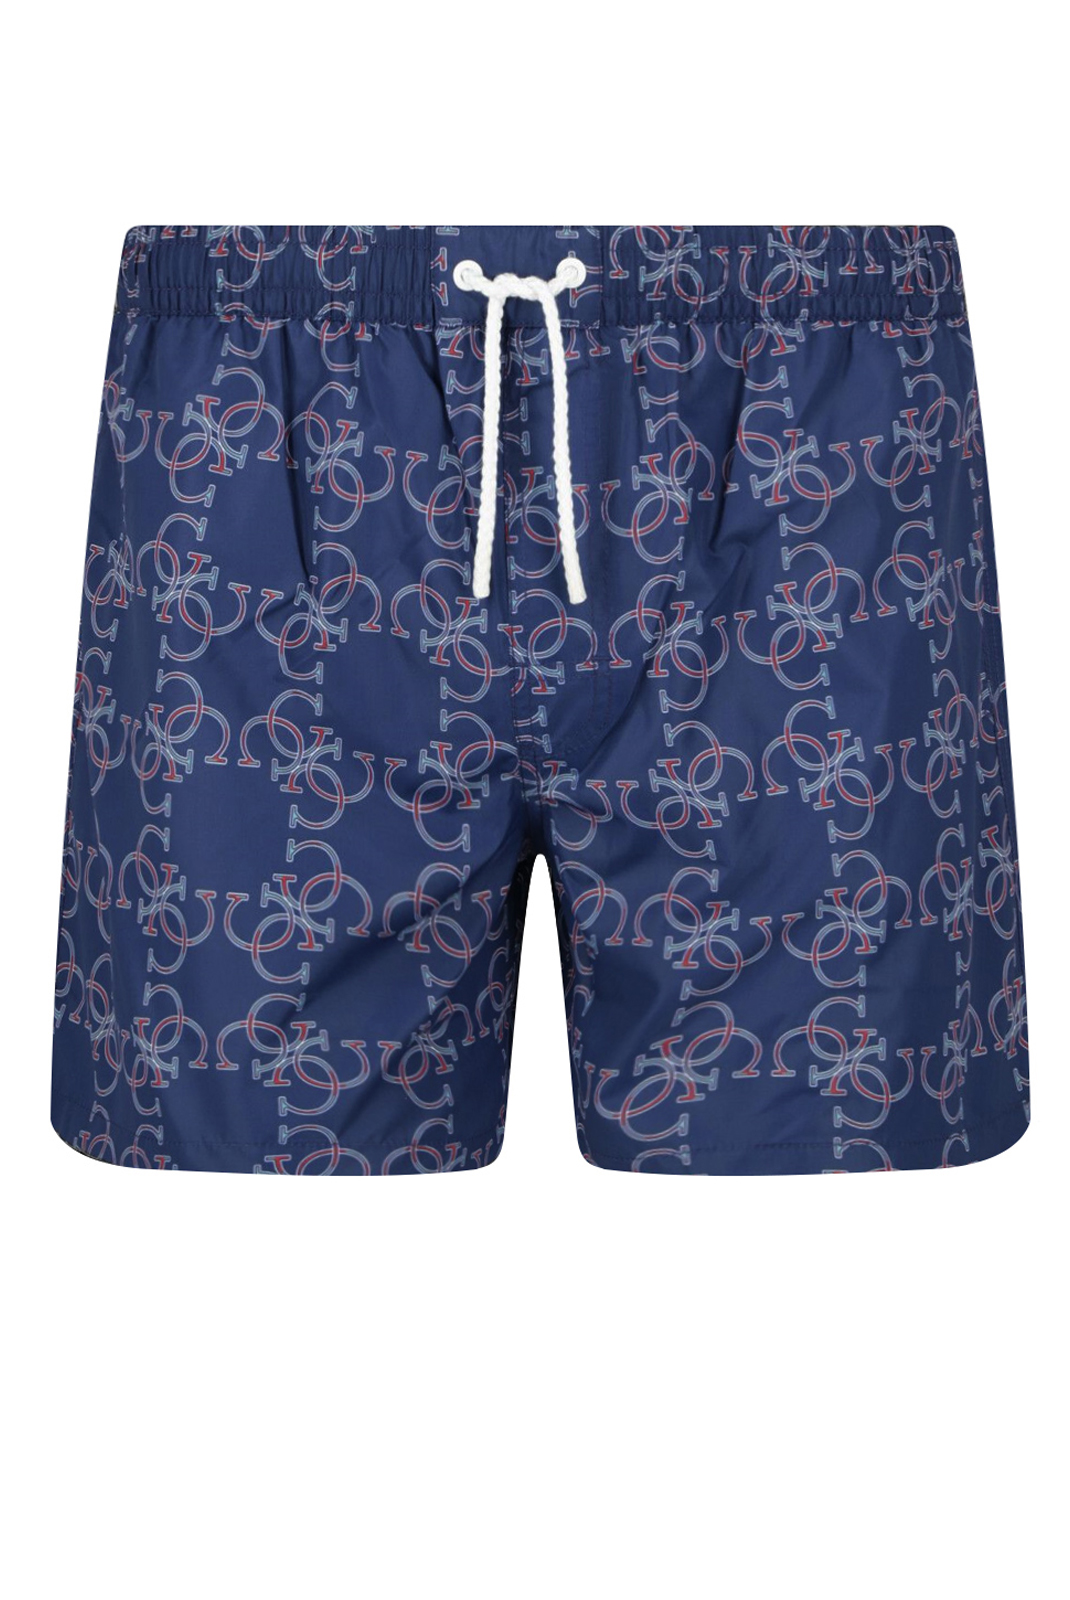 Shorts de bain  Guess jeans F02T03 TEL60 U168 4G ALL OVER JET BLACK